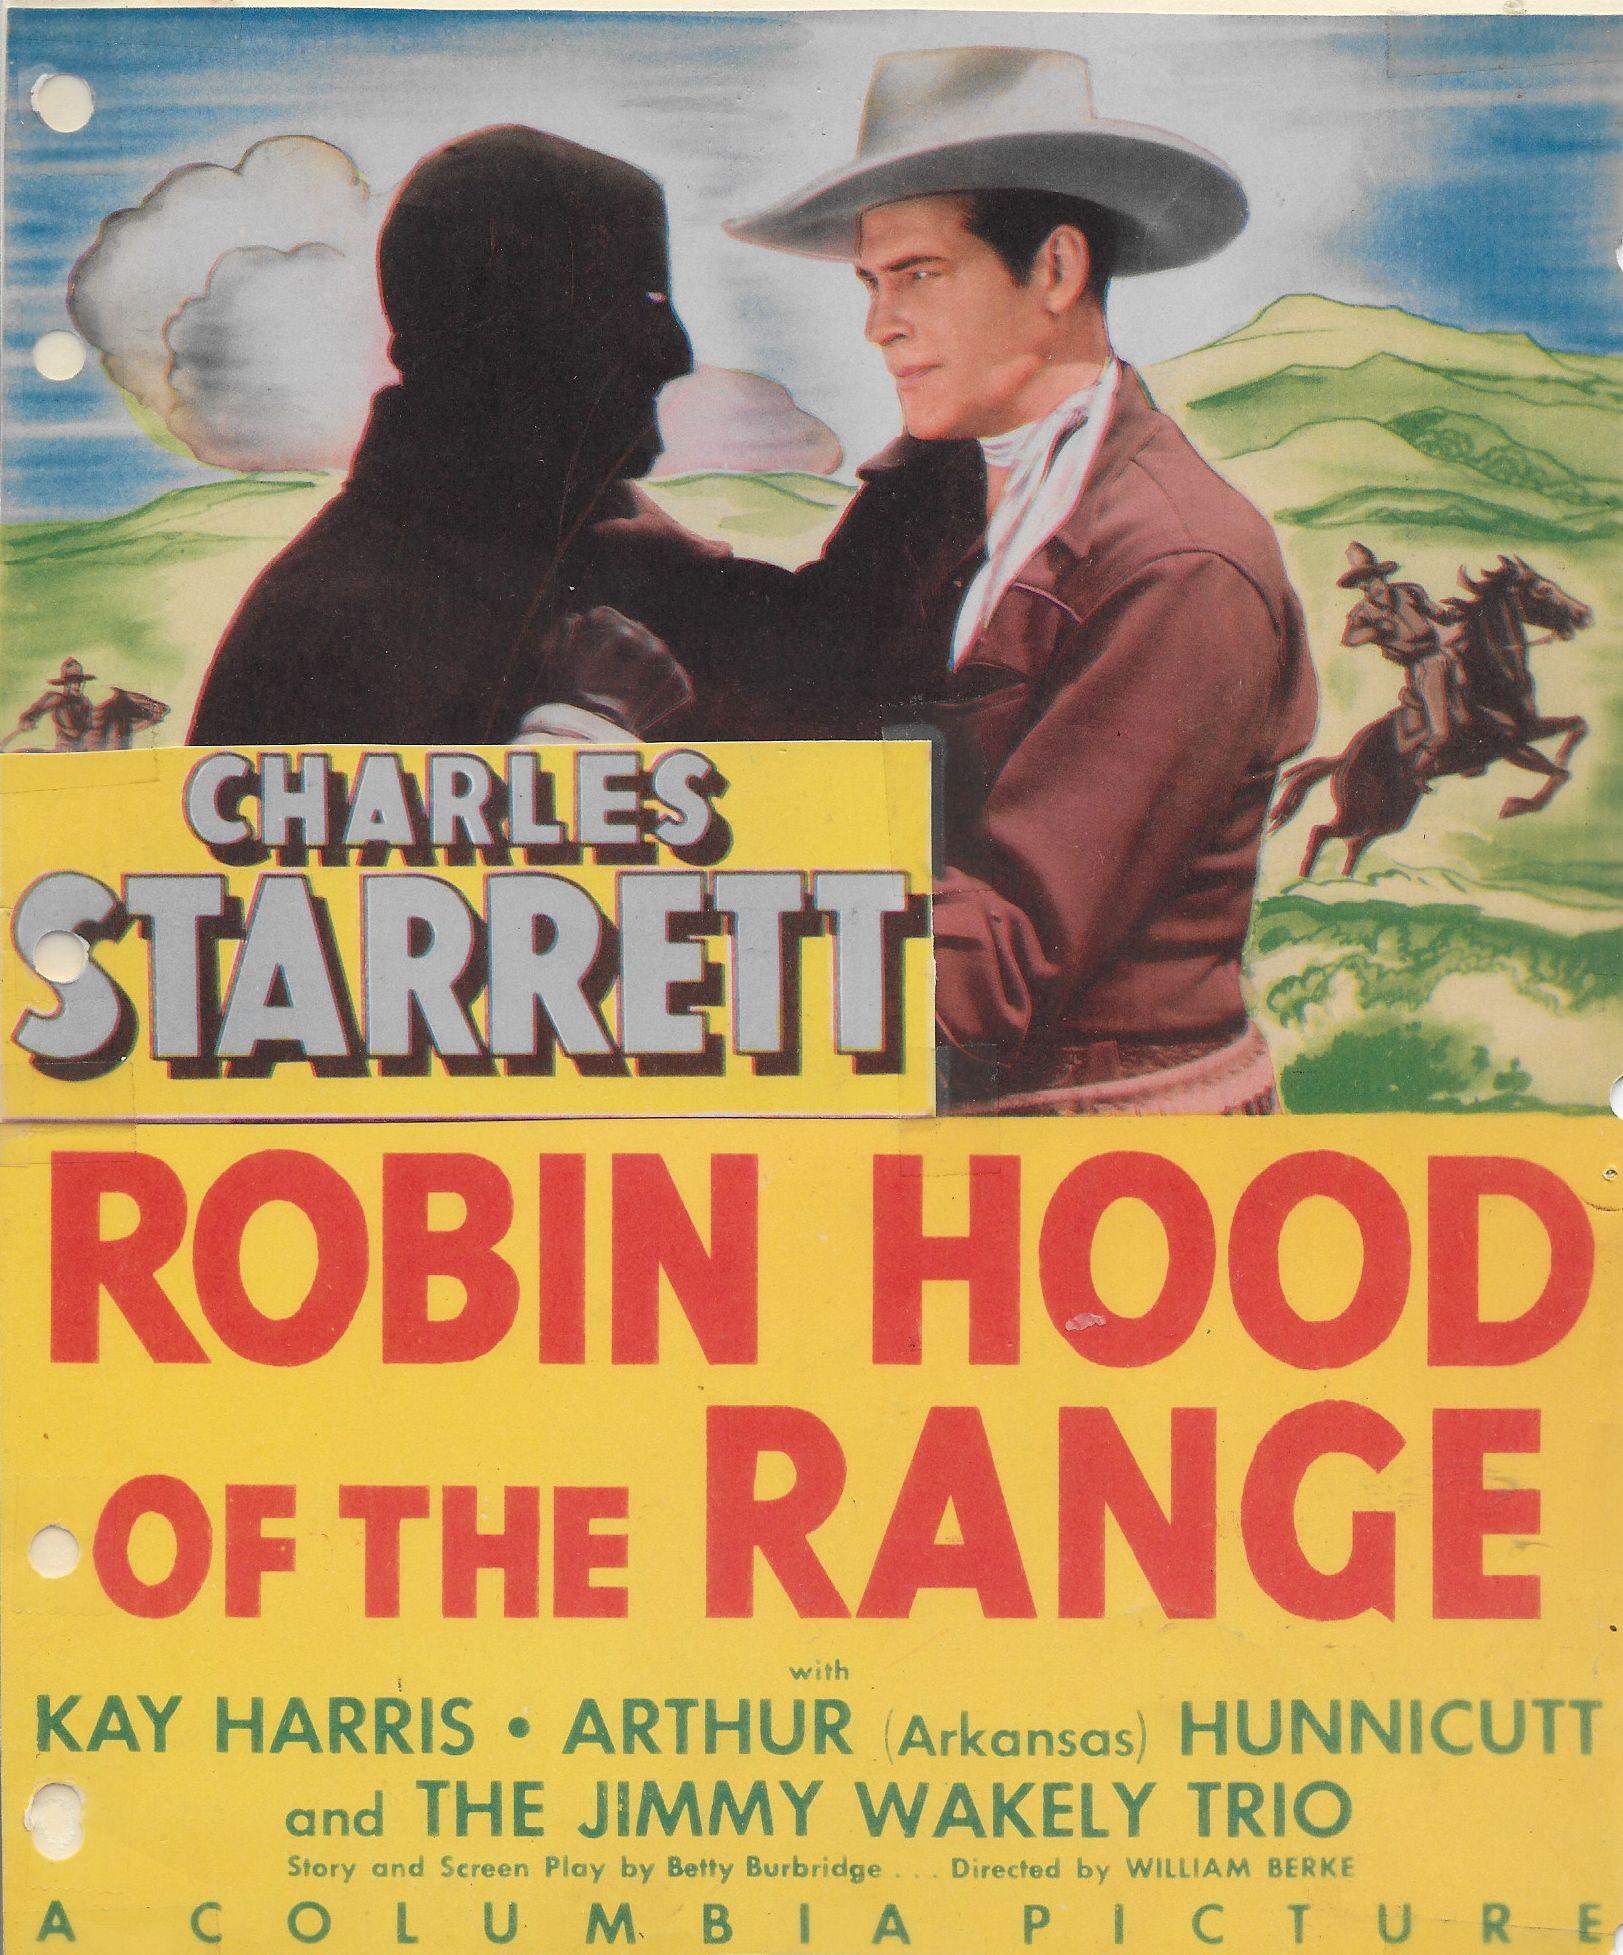 Charles Starrett in Robin Hood of the Range (1943)